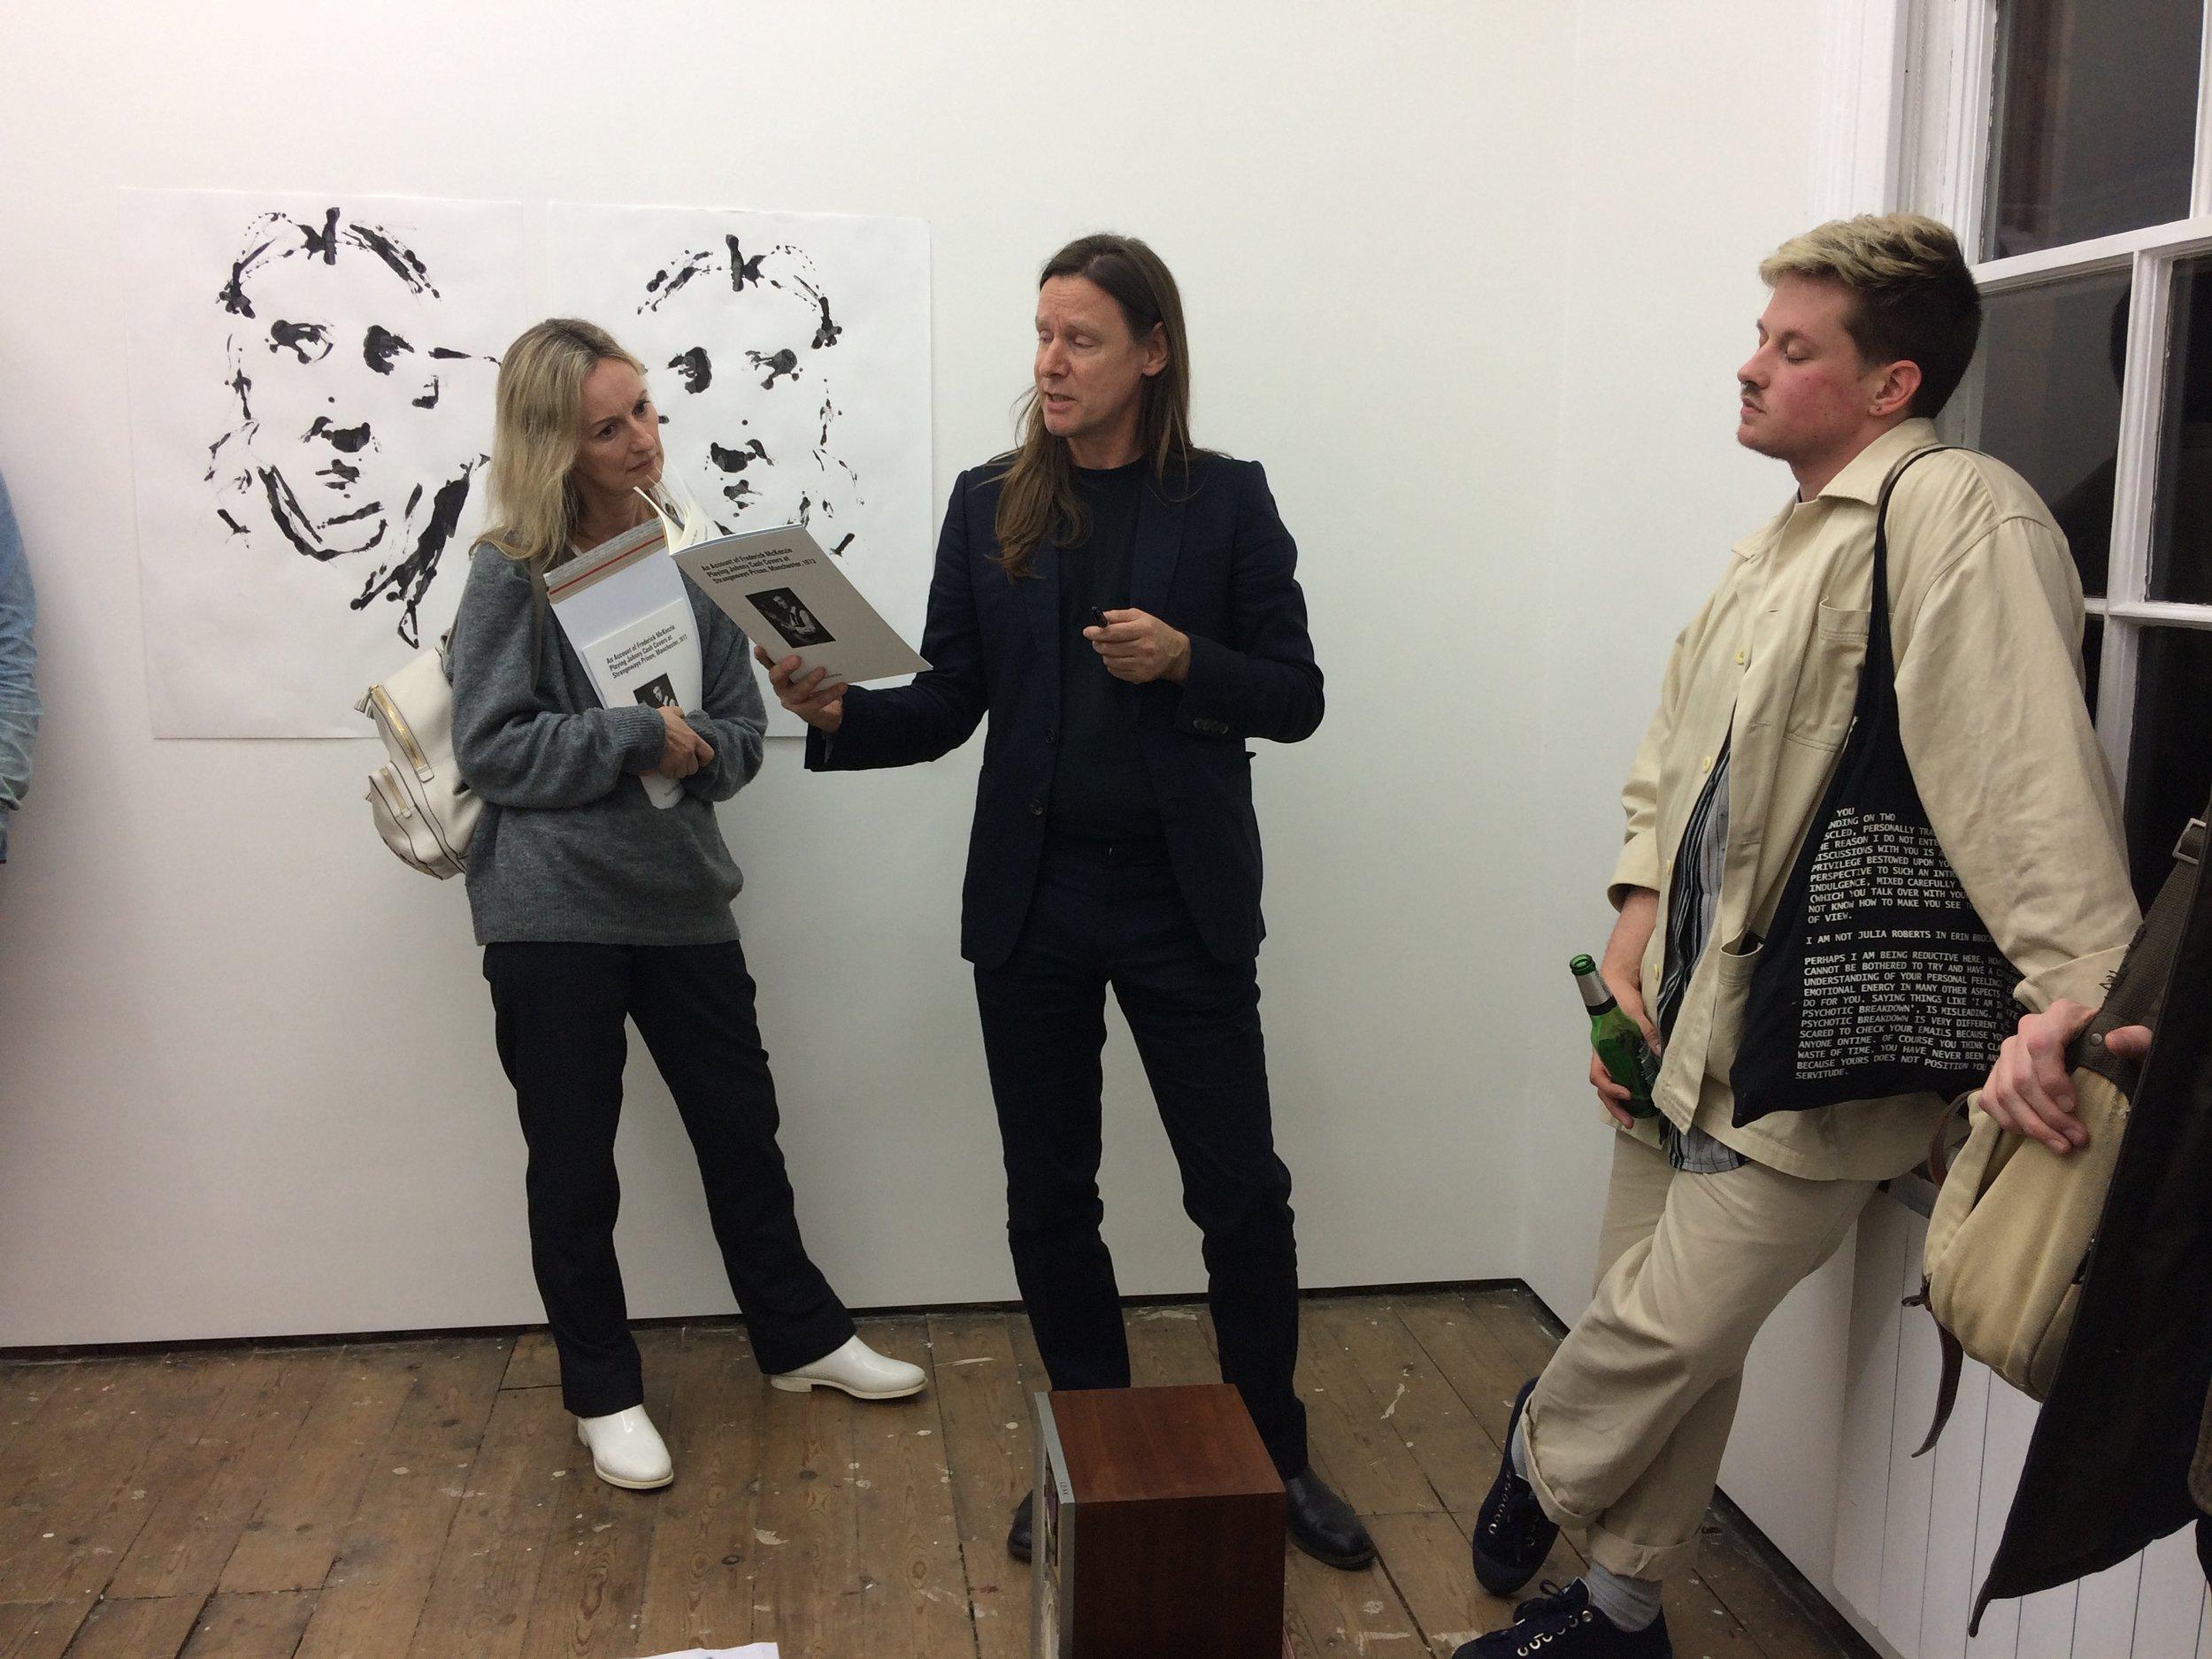 TG gallery Stuart McKenzie Sesame Street readings